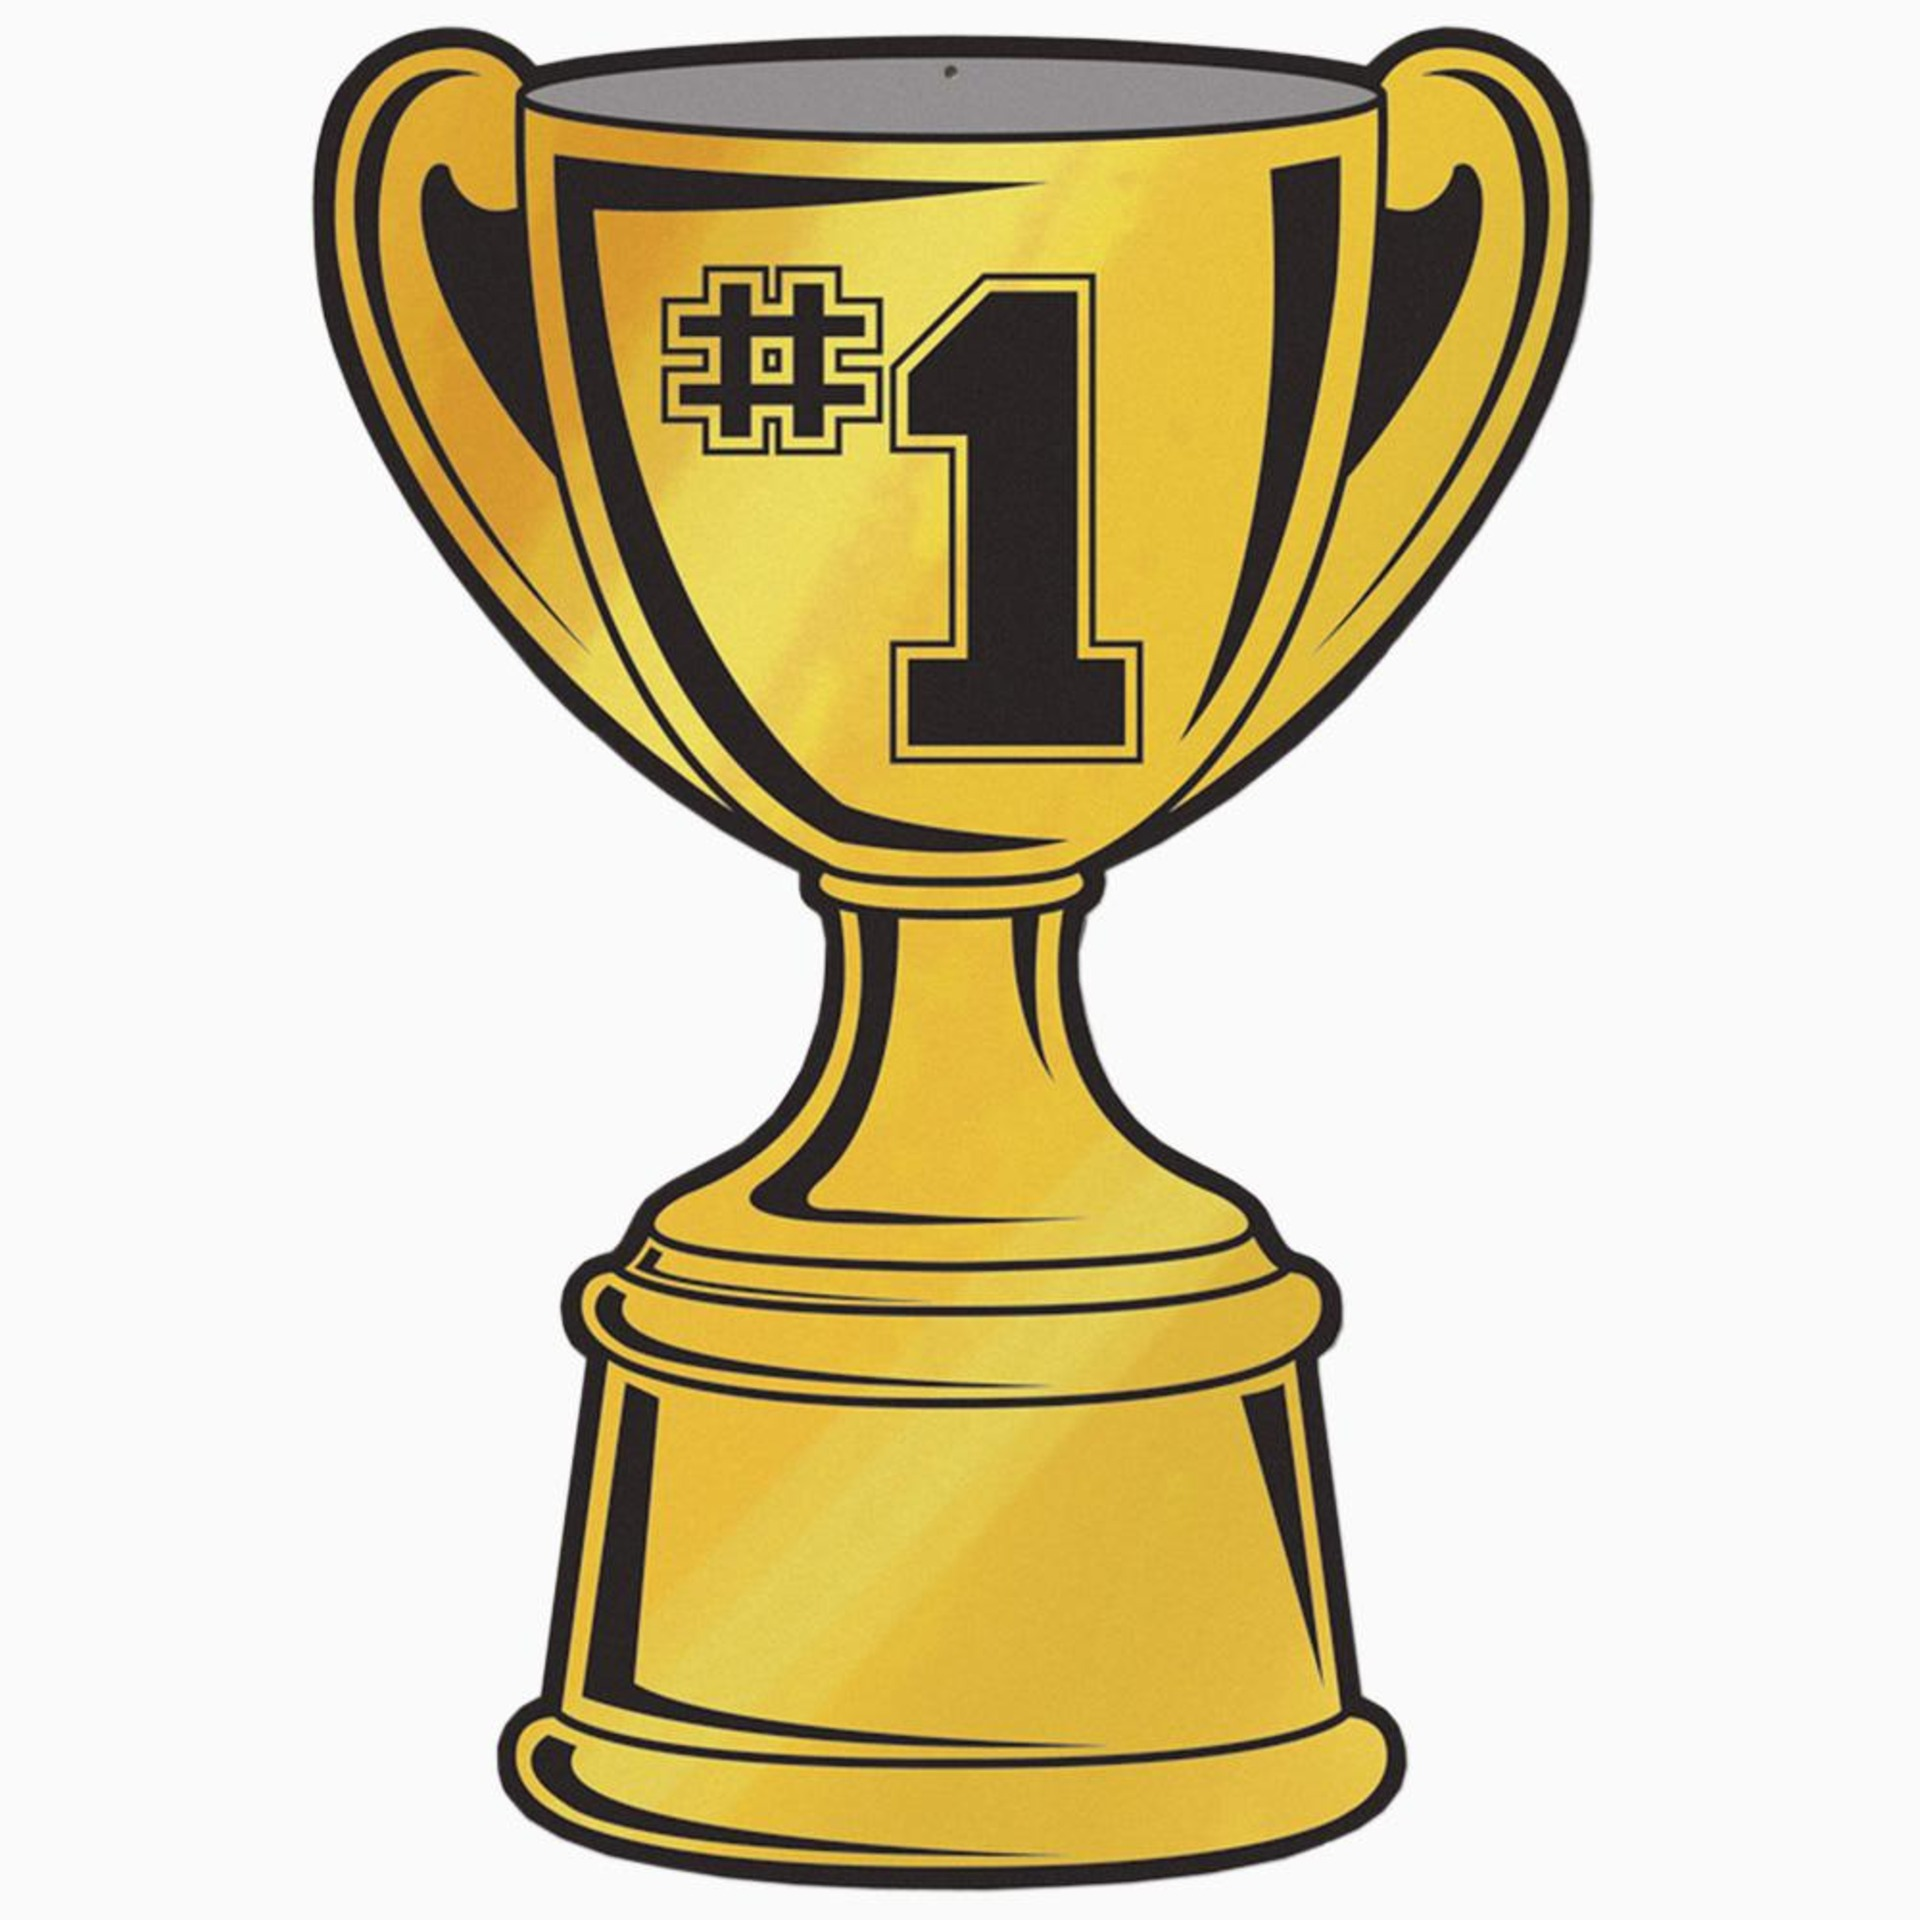 Race Car Trophy >> Star Trophy Clipart | Clipart Panda - Free Clipart Images